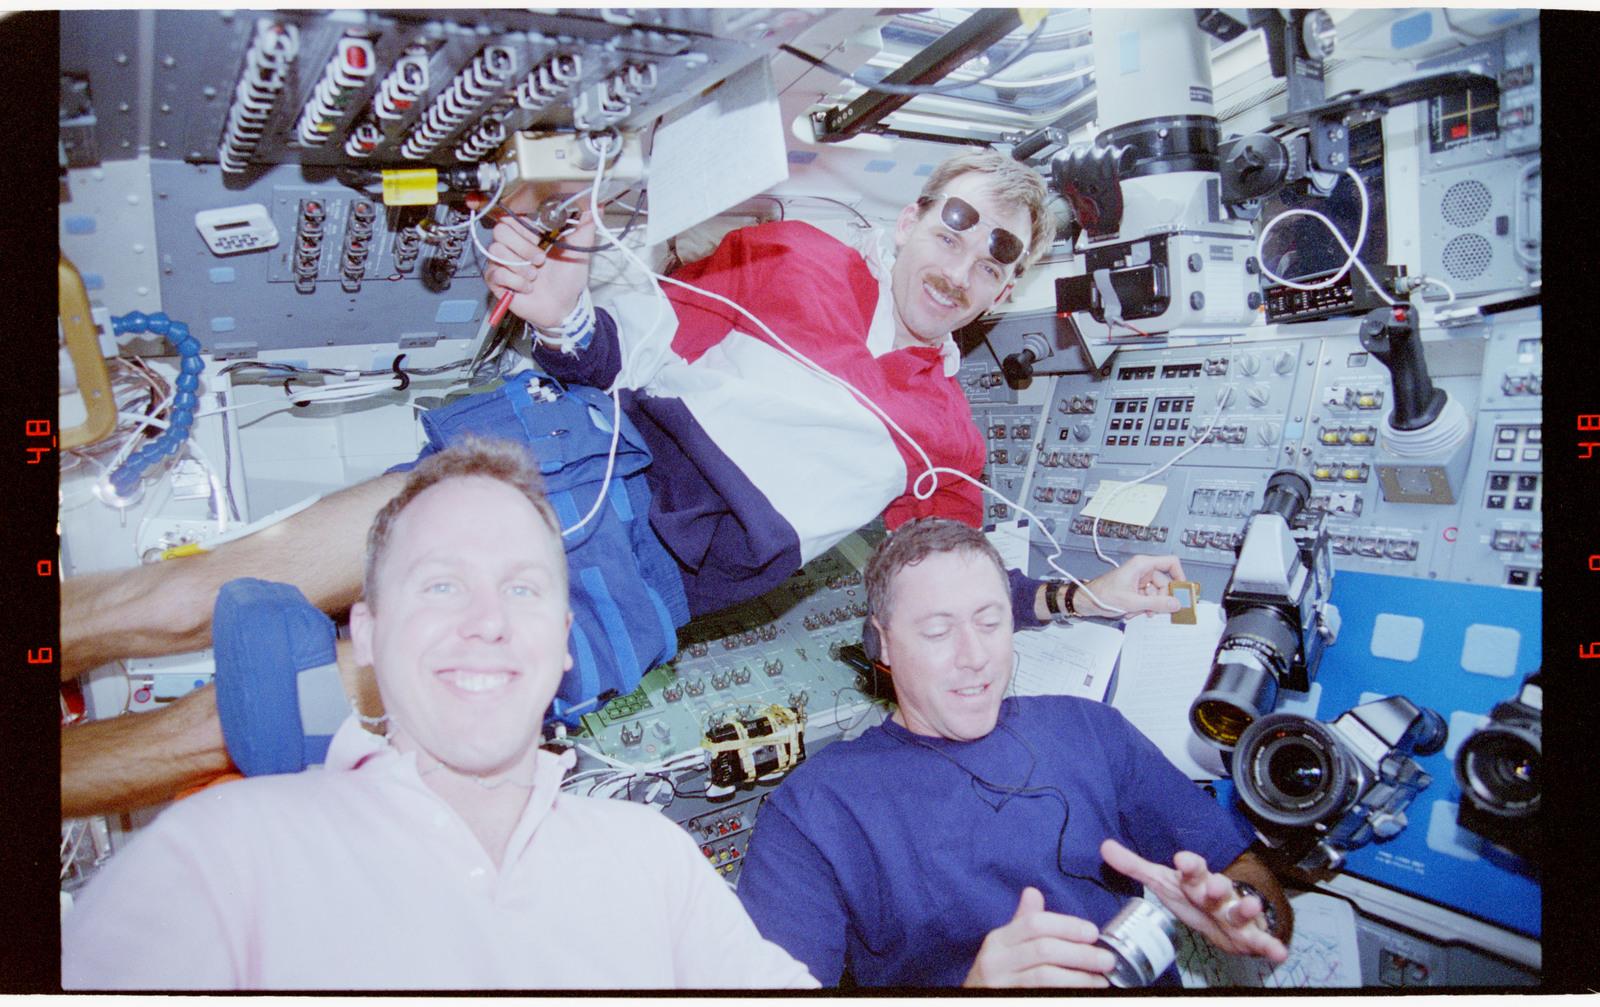 STS068-41-005 - STS-068 - STS-68 crew on orbiter flight deck